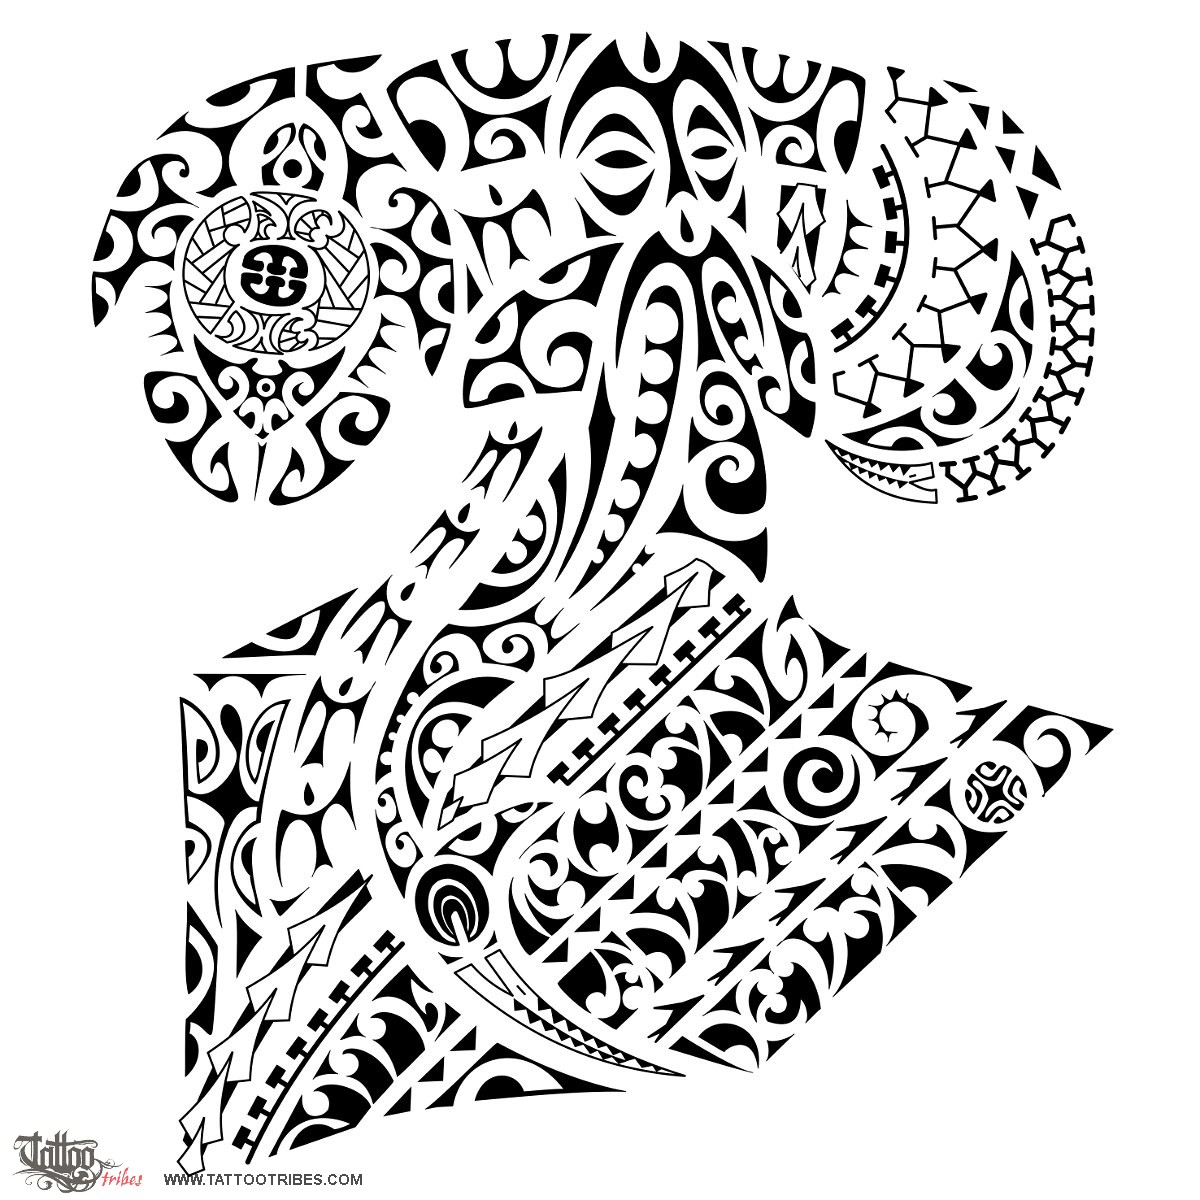 http://1.bp.blogspot.com/-Sxhx_jVMpWs/UA2hN-5zobI/AAAAAAAAaN0/rFpN6_1FV_I/s1600/maori+tattoo+korero-story-tattoo.jpg